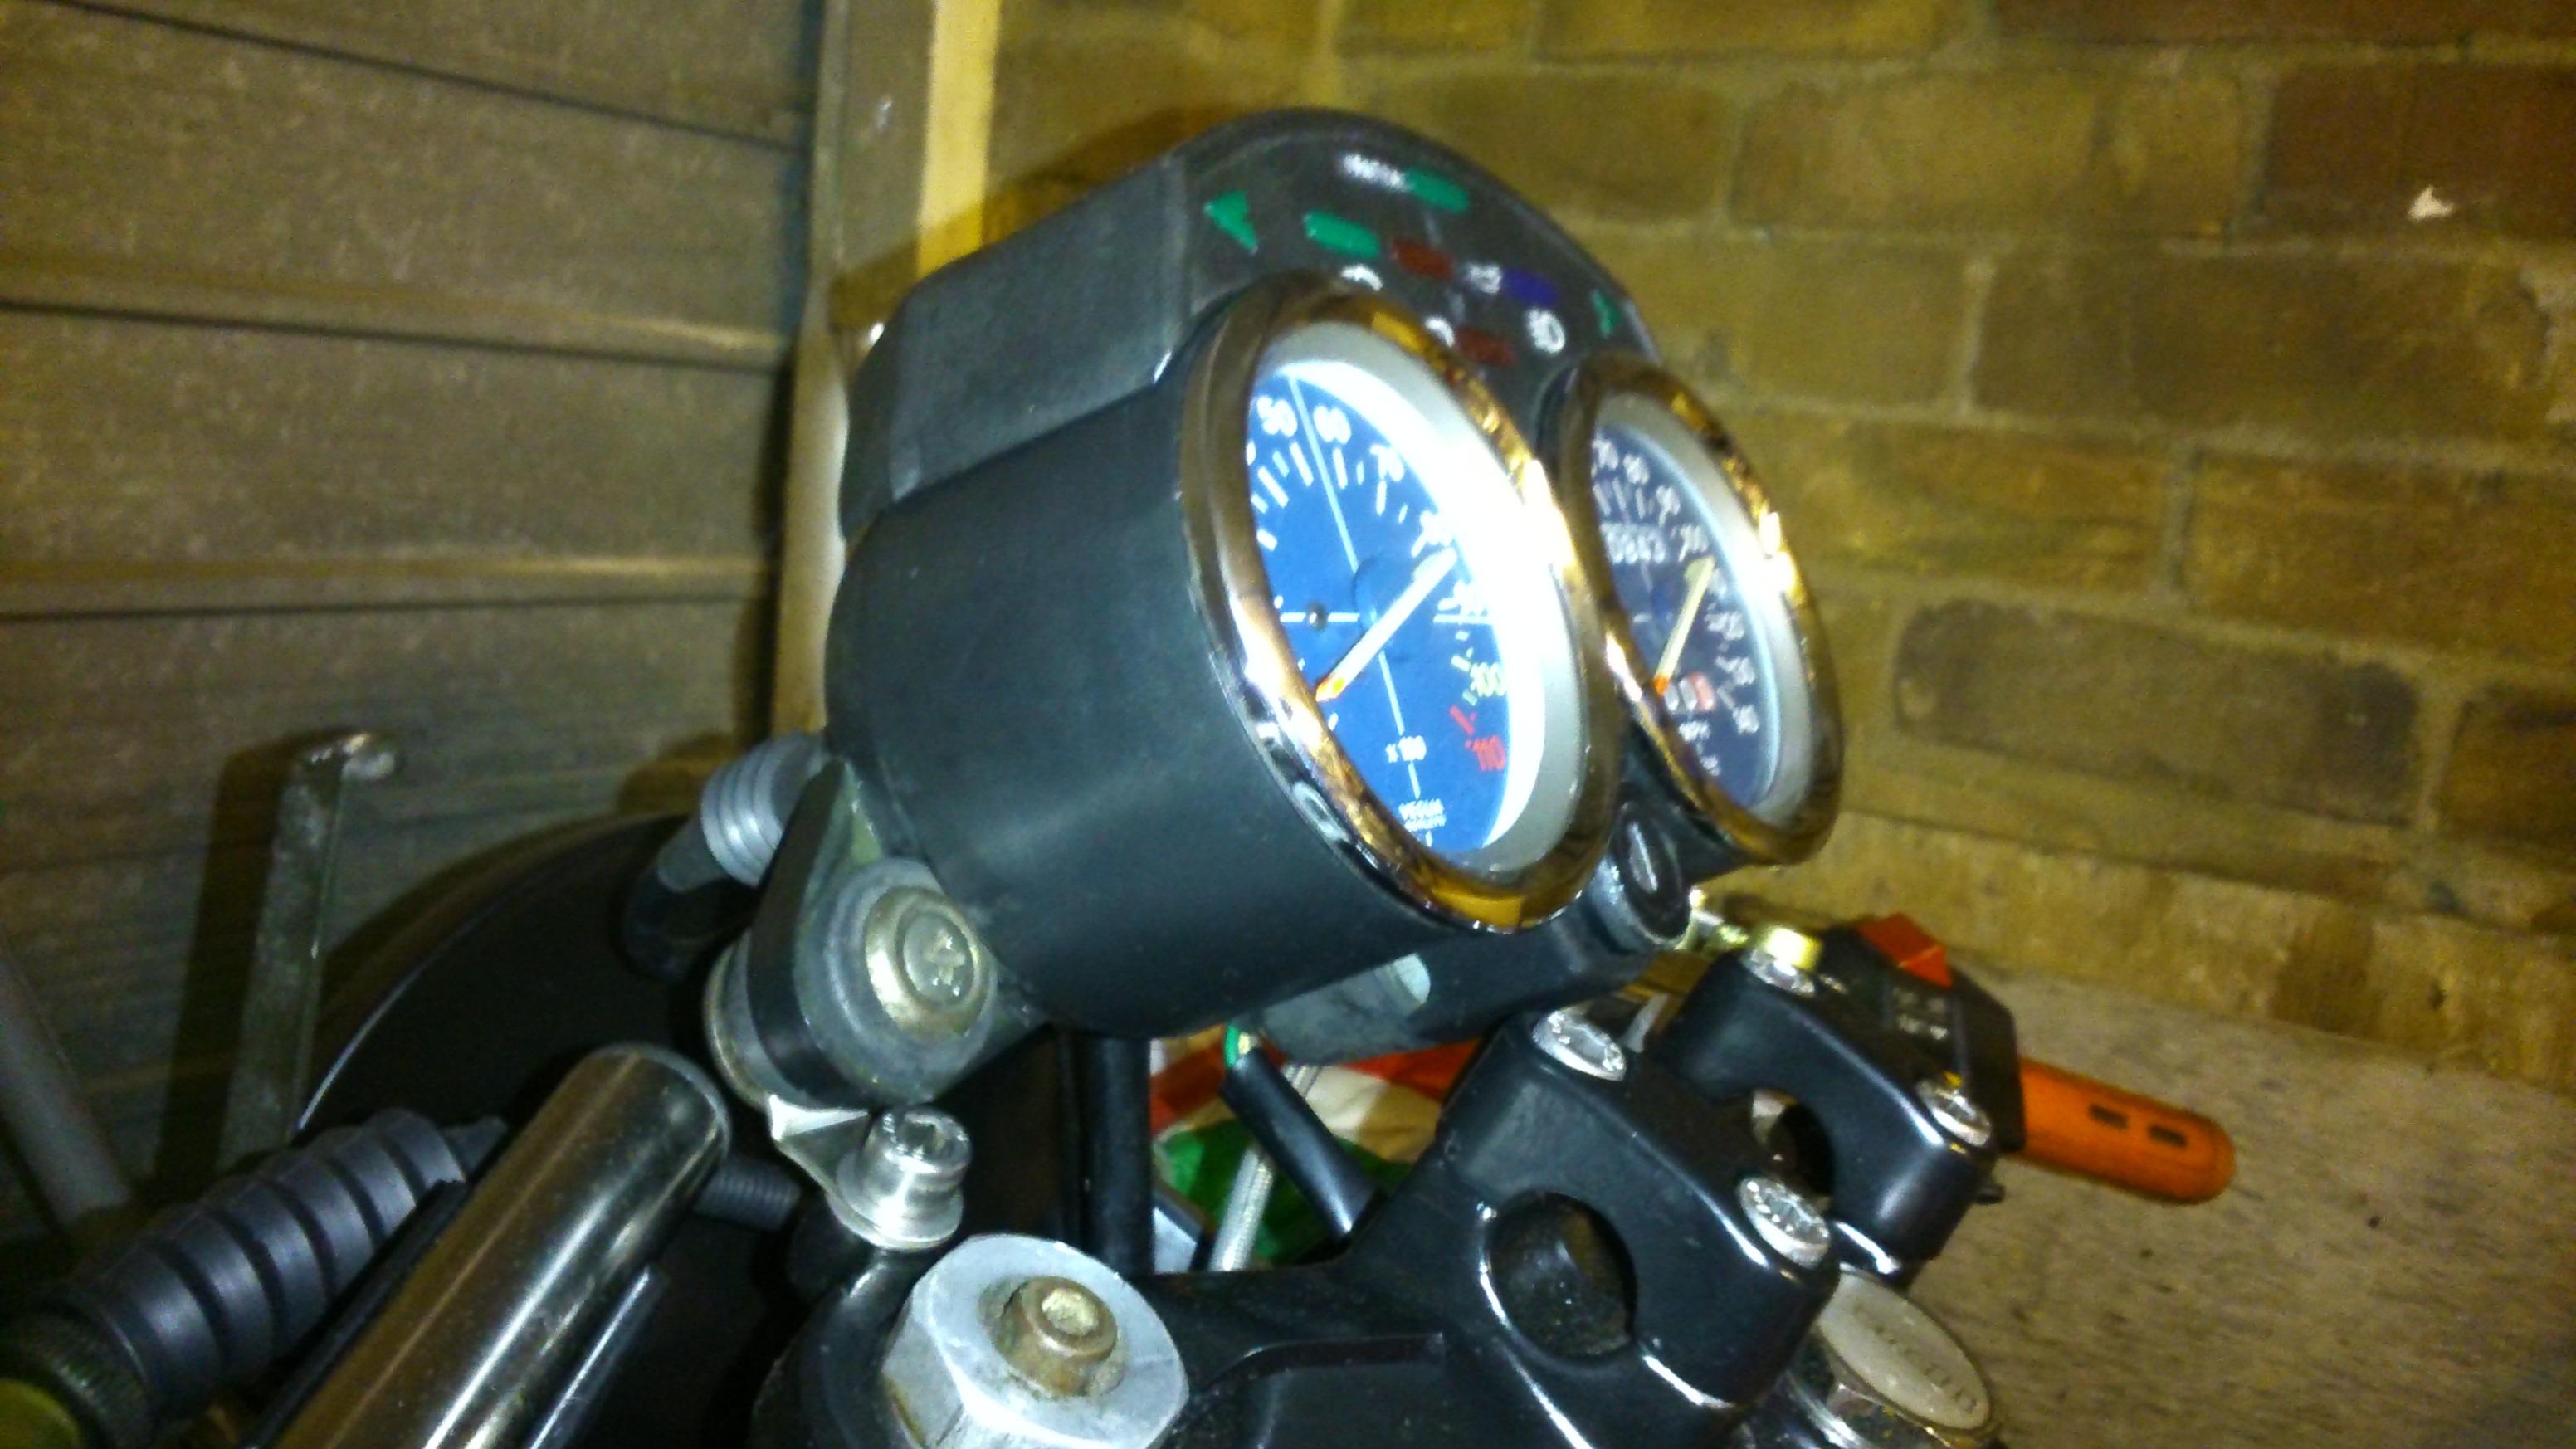 Veglia Clock refurbishment-dsc_0173.jpg